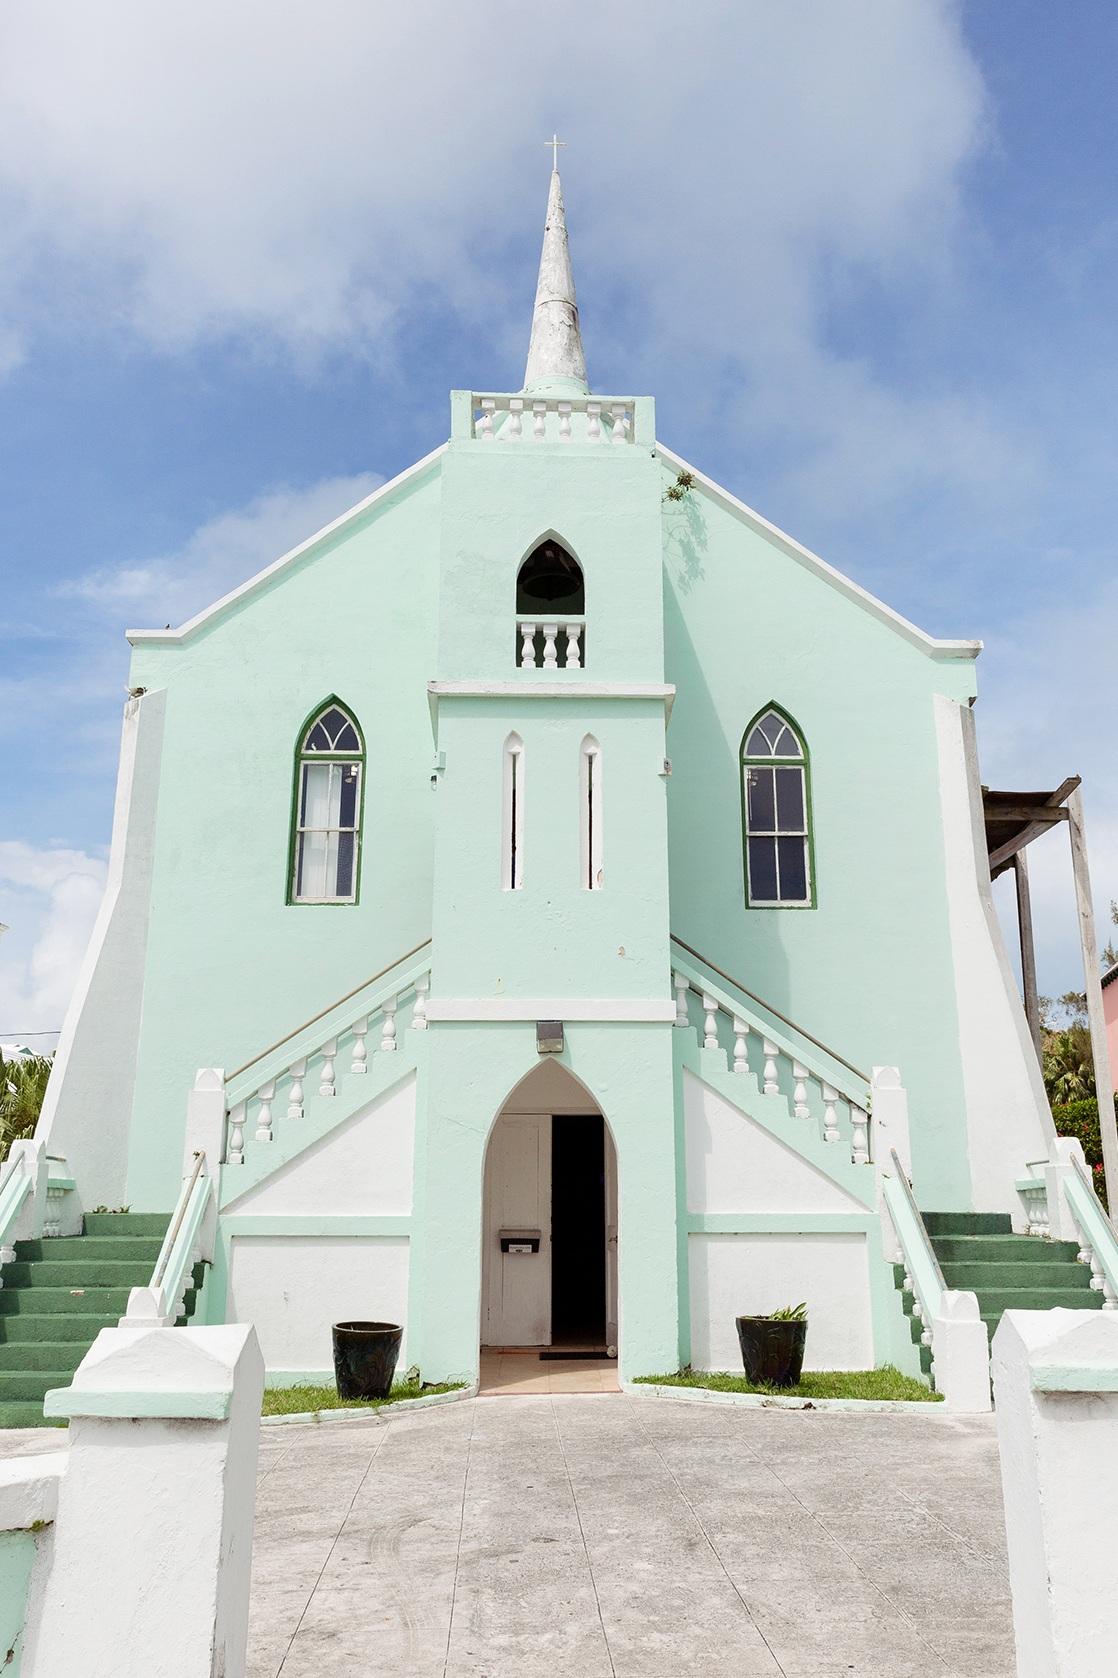 20190609_WWT_Bermuda_Day3_932A9815.jpg